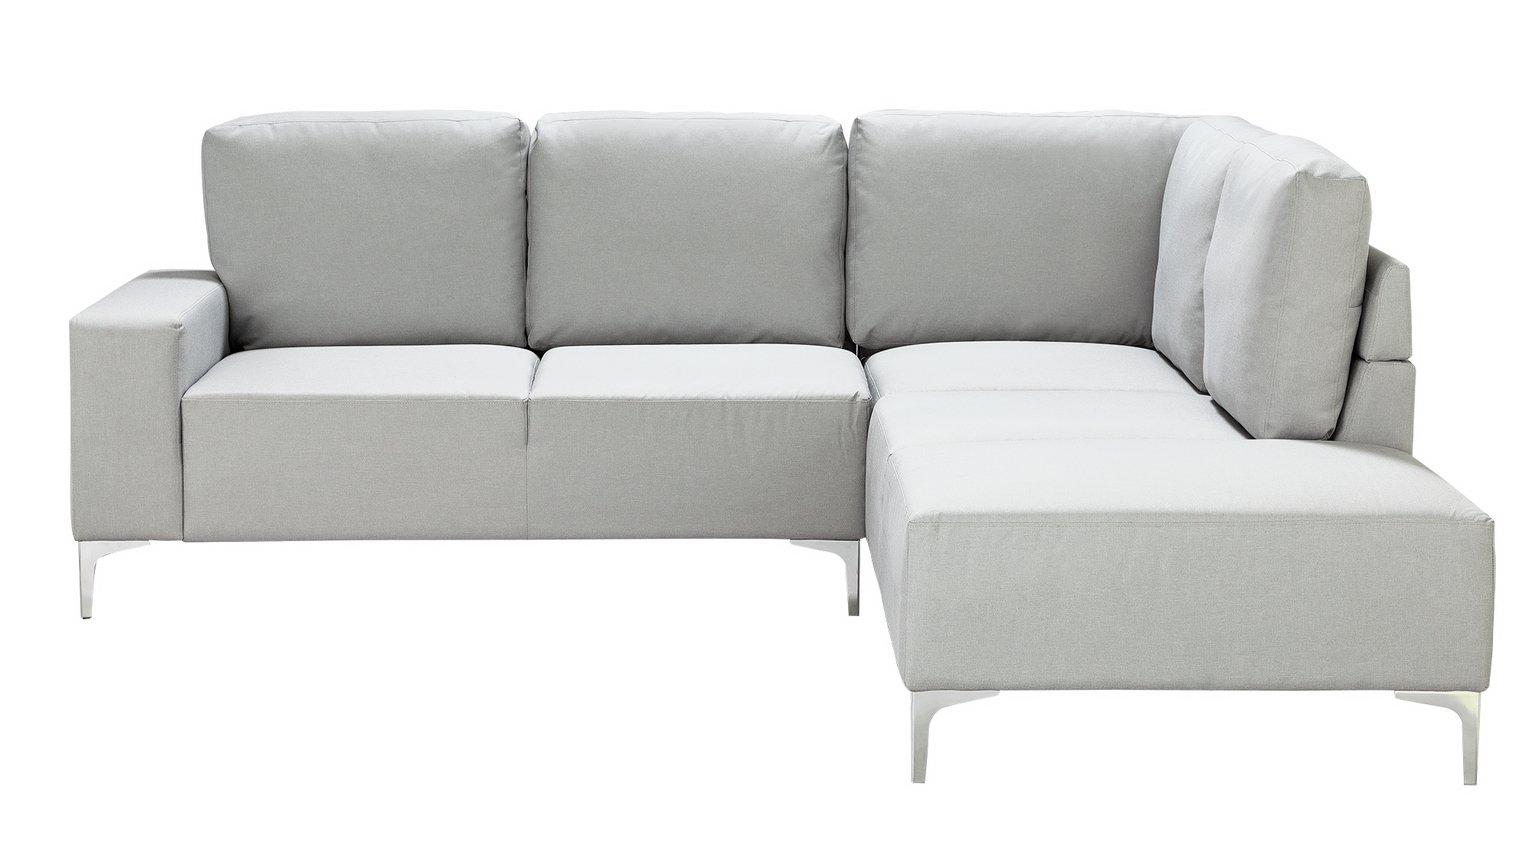 Argos Home Hale Right Corner Fabric Sofa - Light Grey